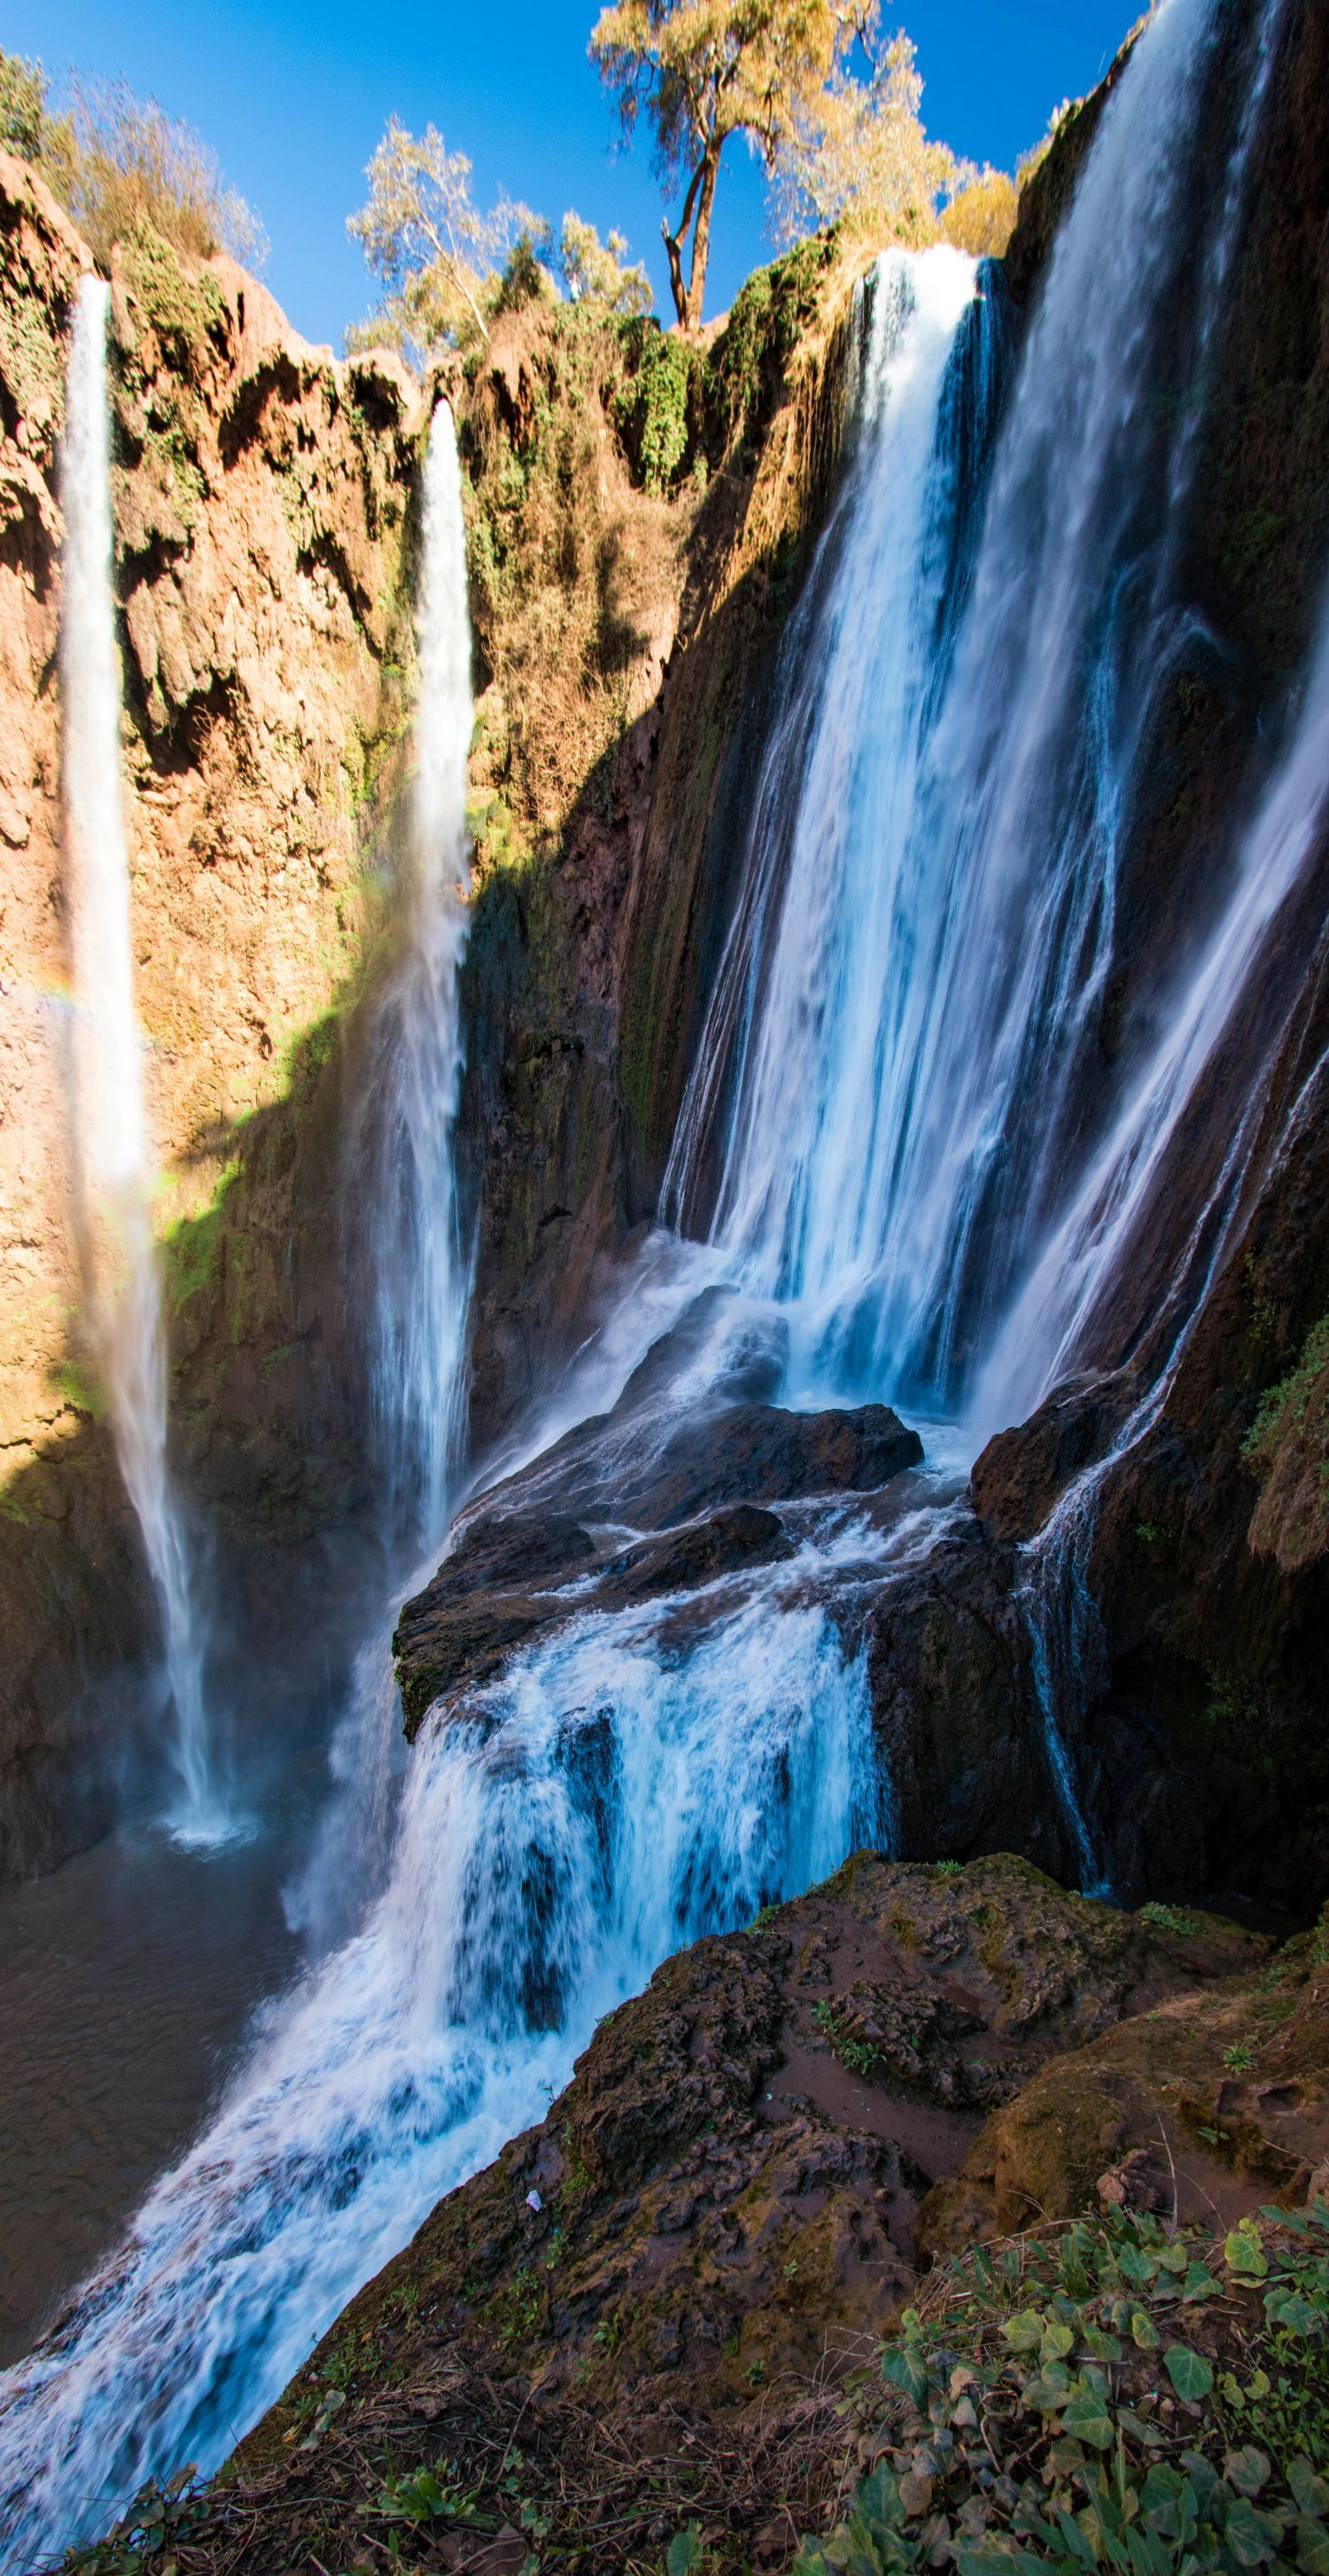 Waterfalls of Ouzoud, Morocco. Cascades d'Ouzoud, Maroc ...